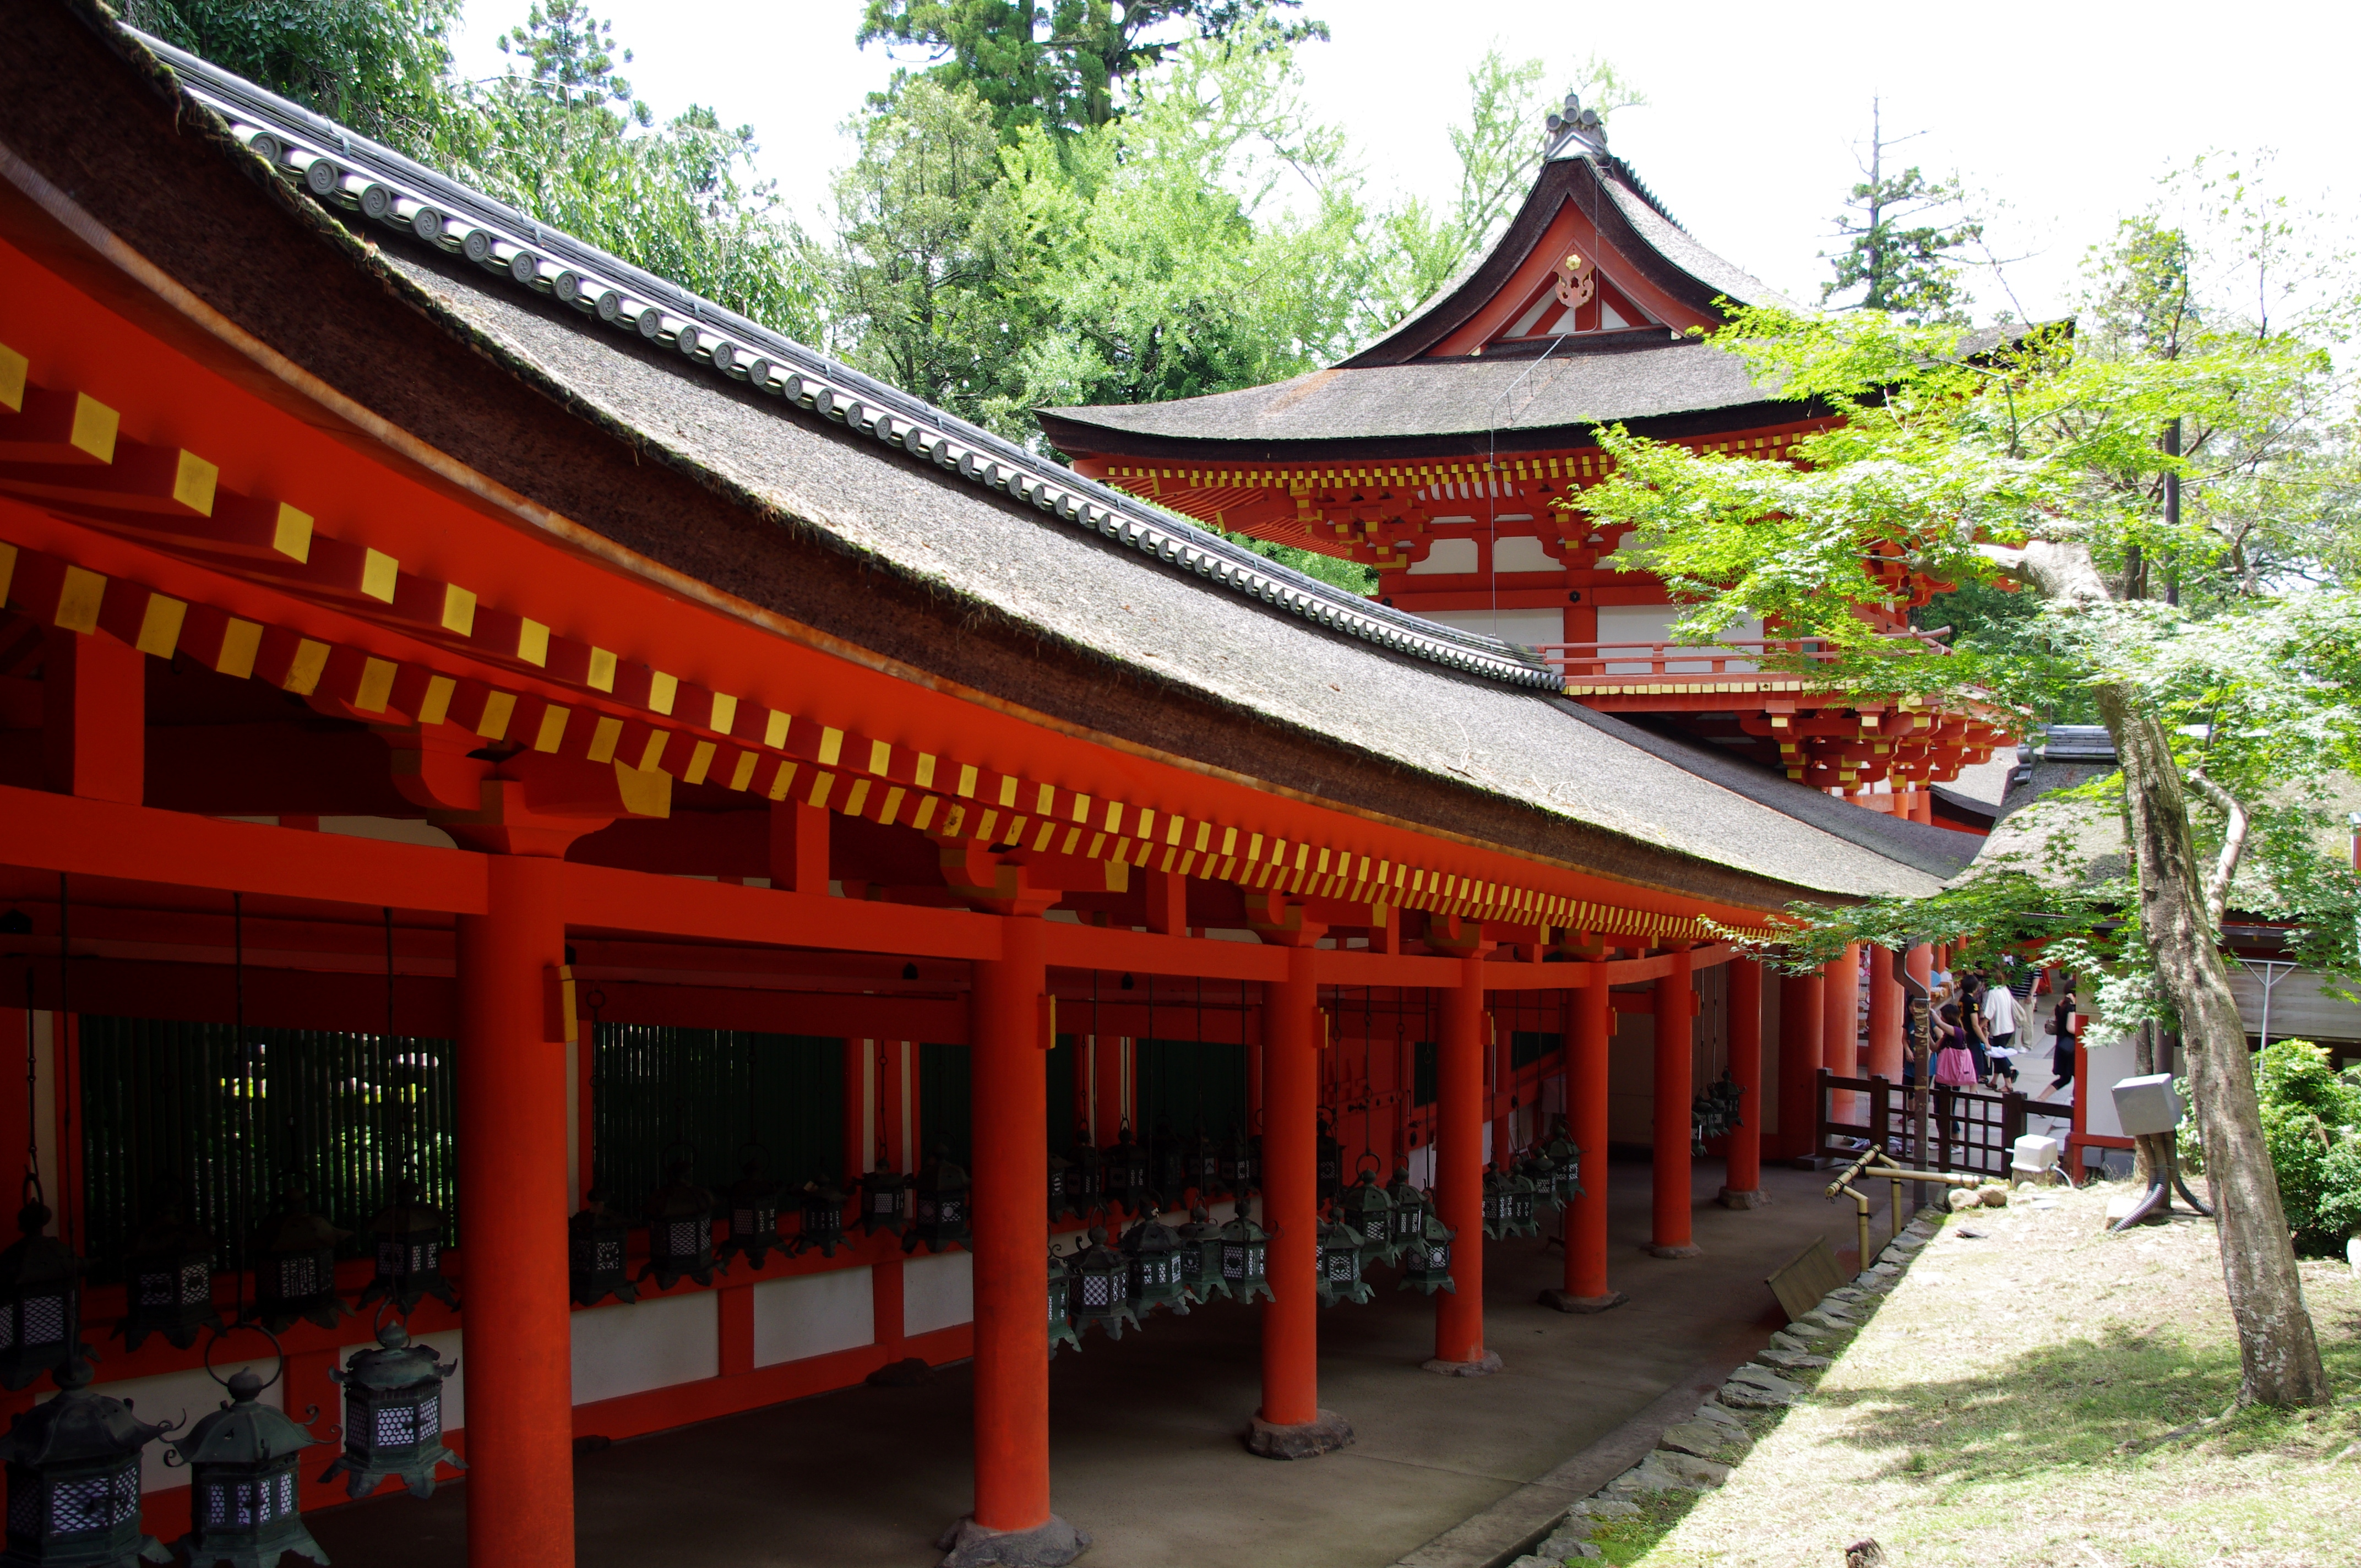 File:20100716 Nara Kasuga-taisha 2196.jpg - Wikimedia Commons